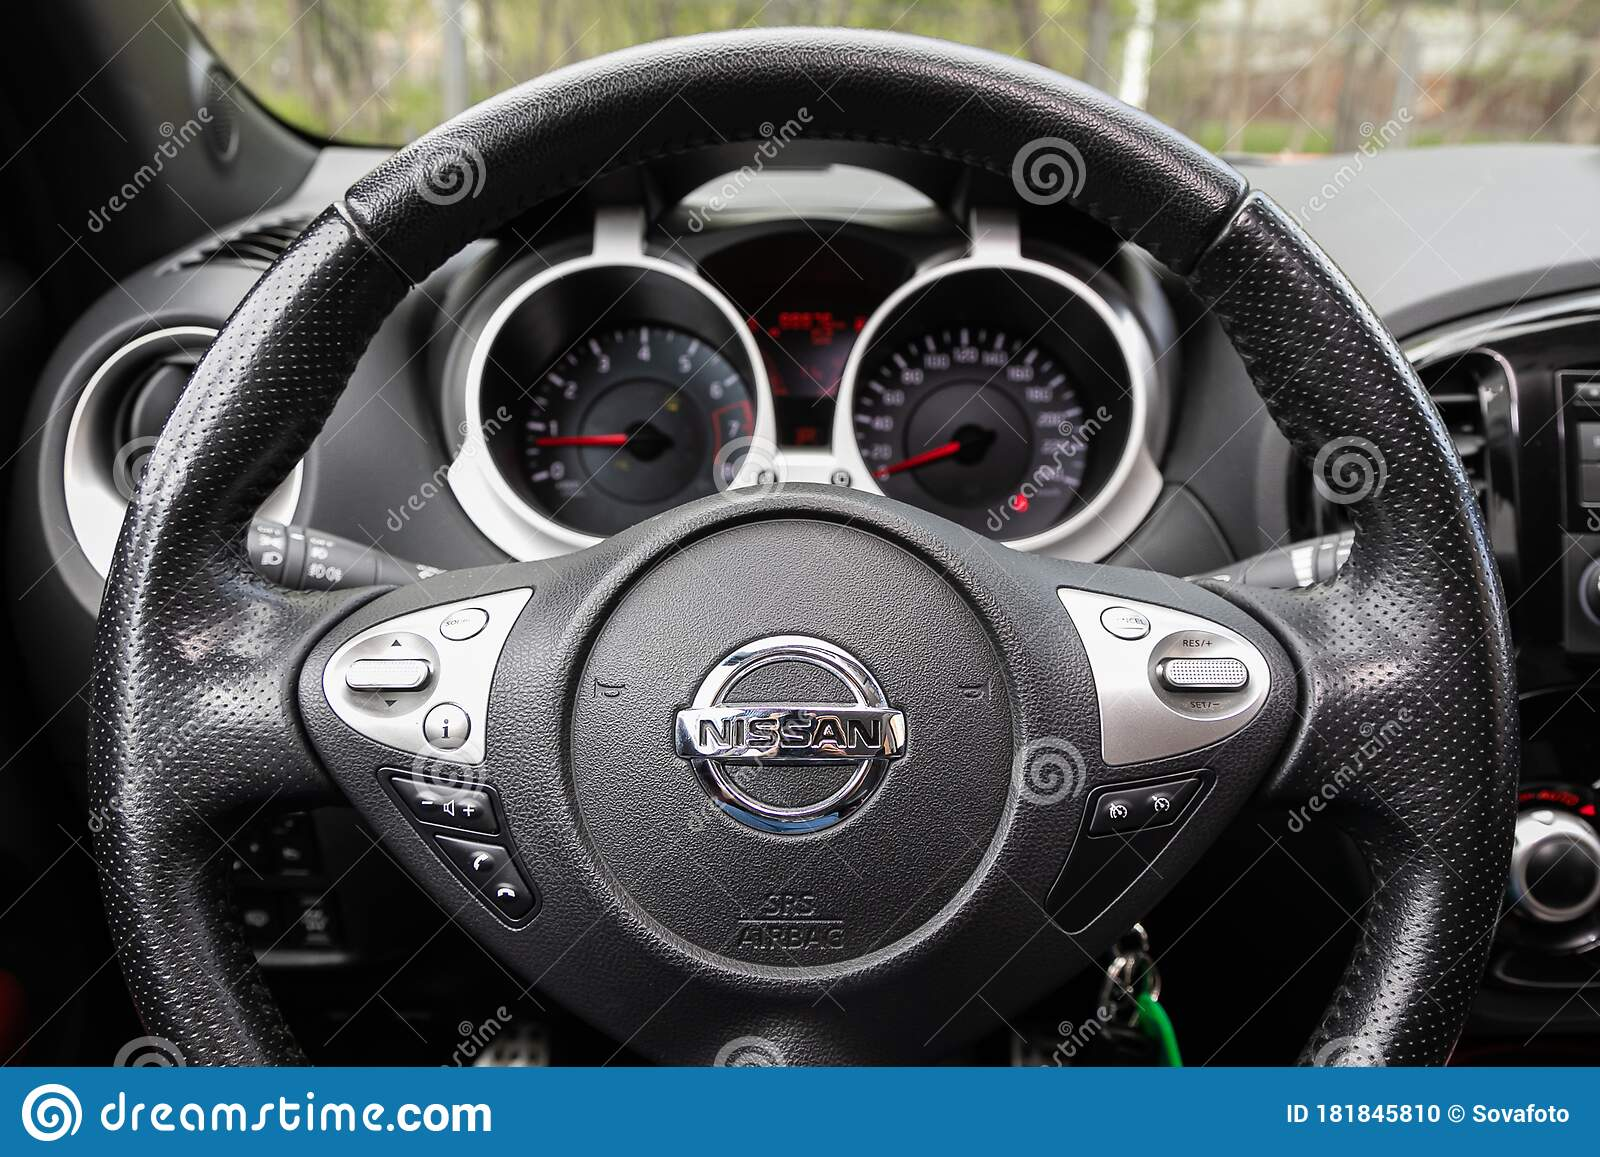 Novosibirsk Russia May 02 2020 Nissan Juke Editorial Image Image Of Panel Black 181845810